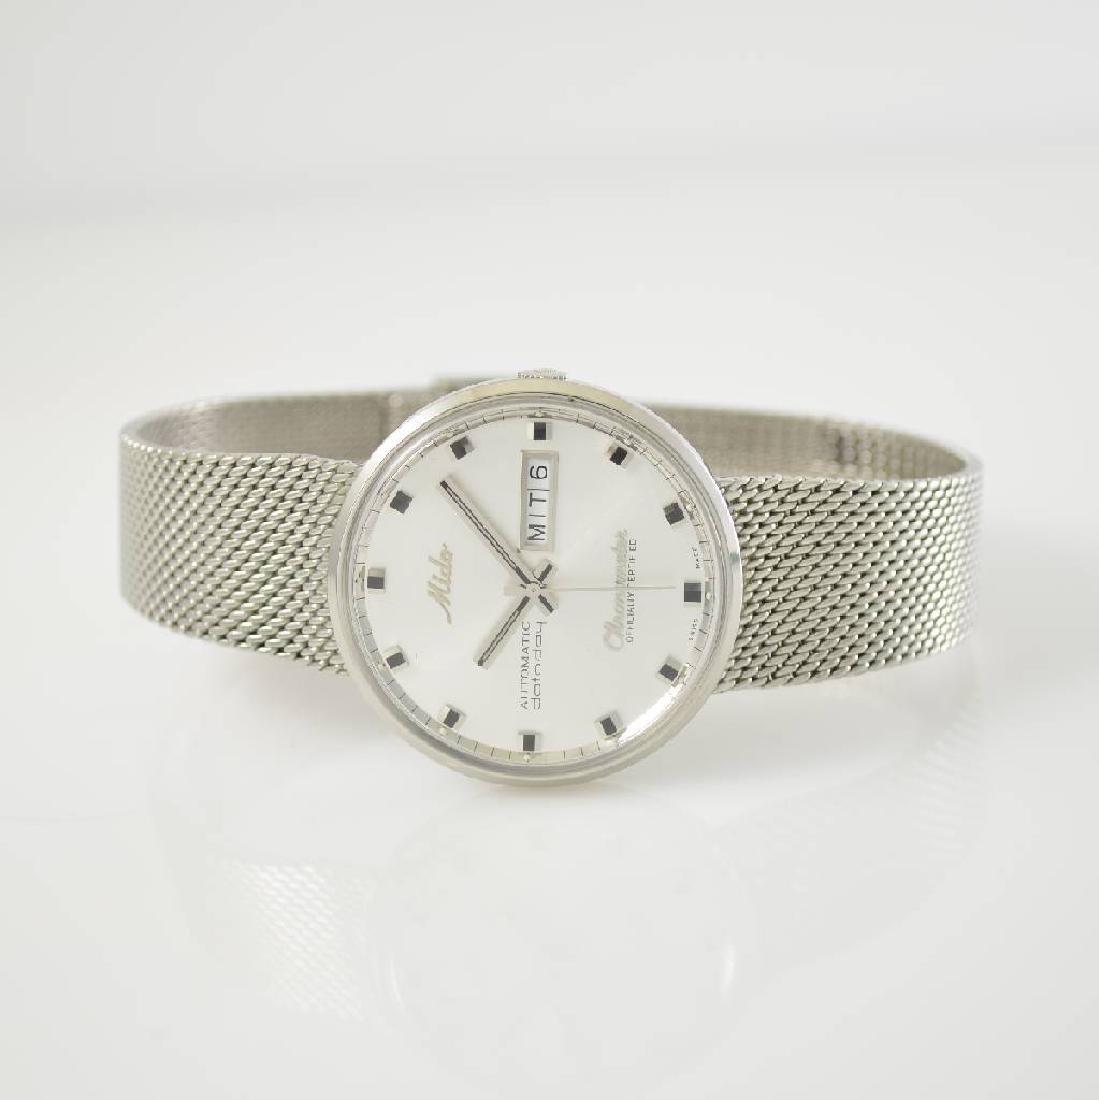 MIDO datoday chronometer gents wristwatch in steel